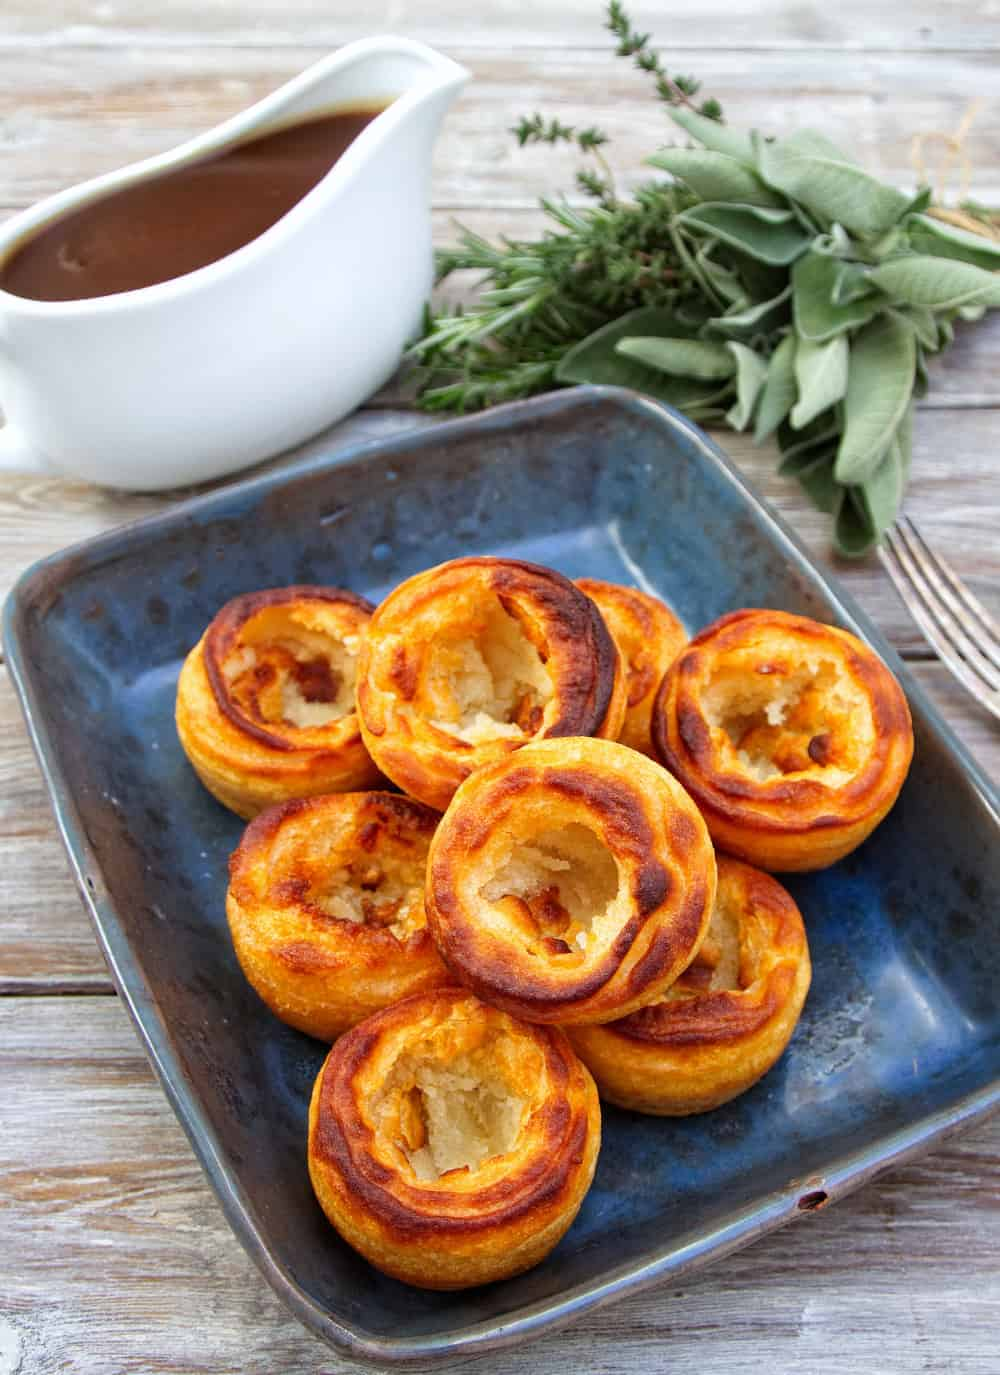 Gluten Free & Vegan Yorkshire Puddings